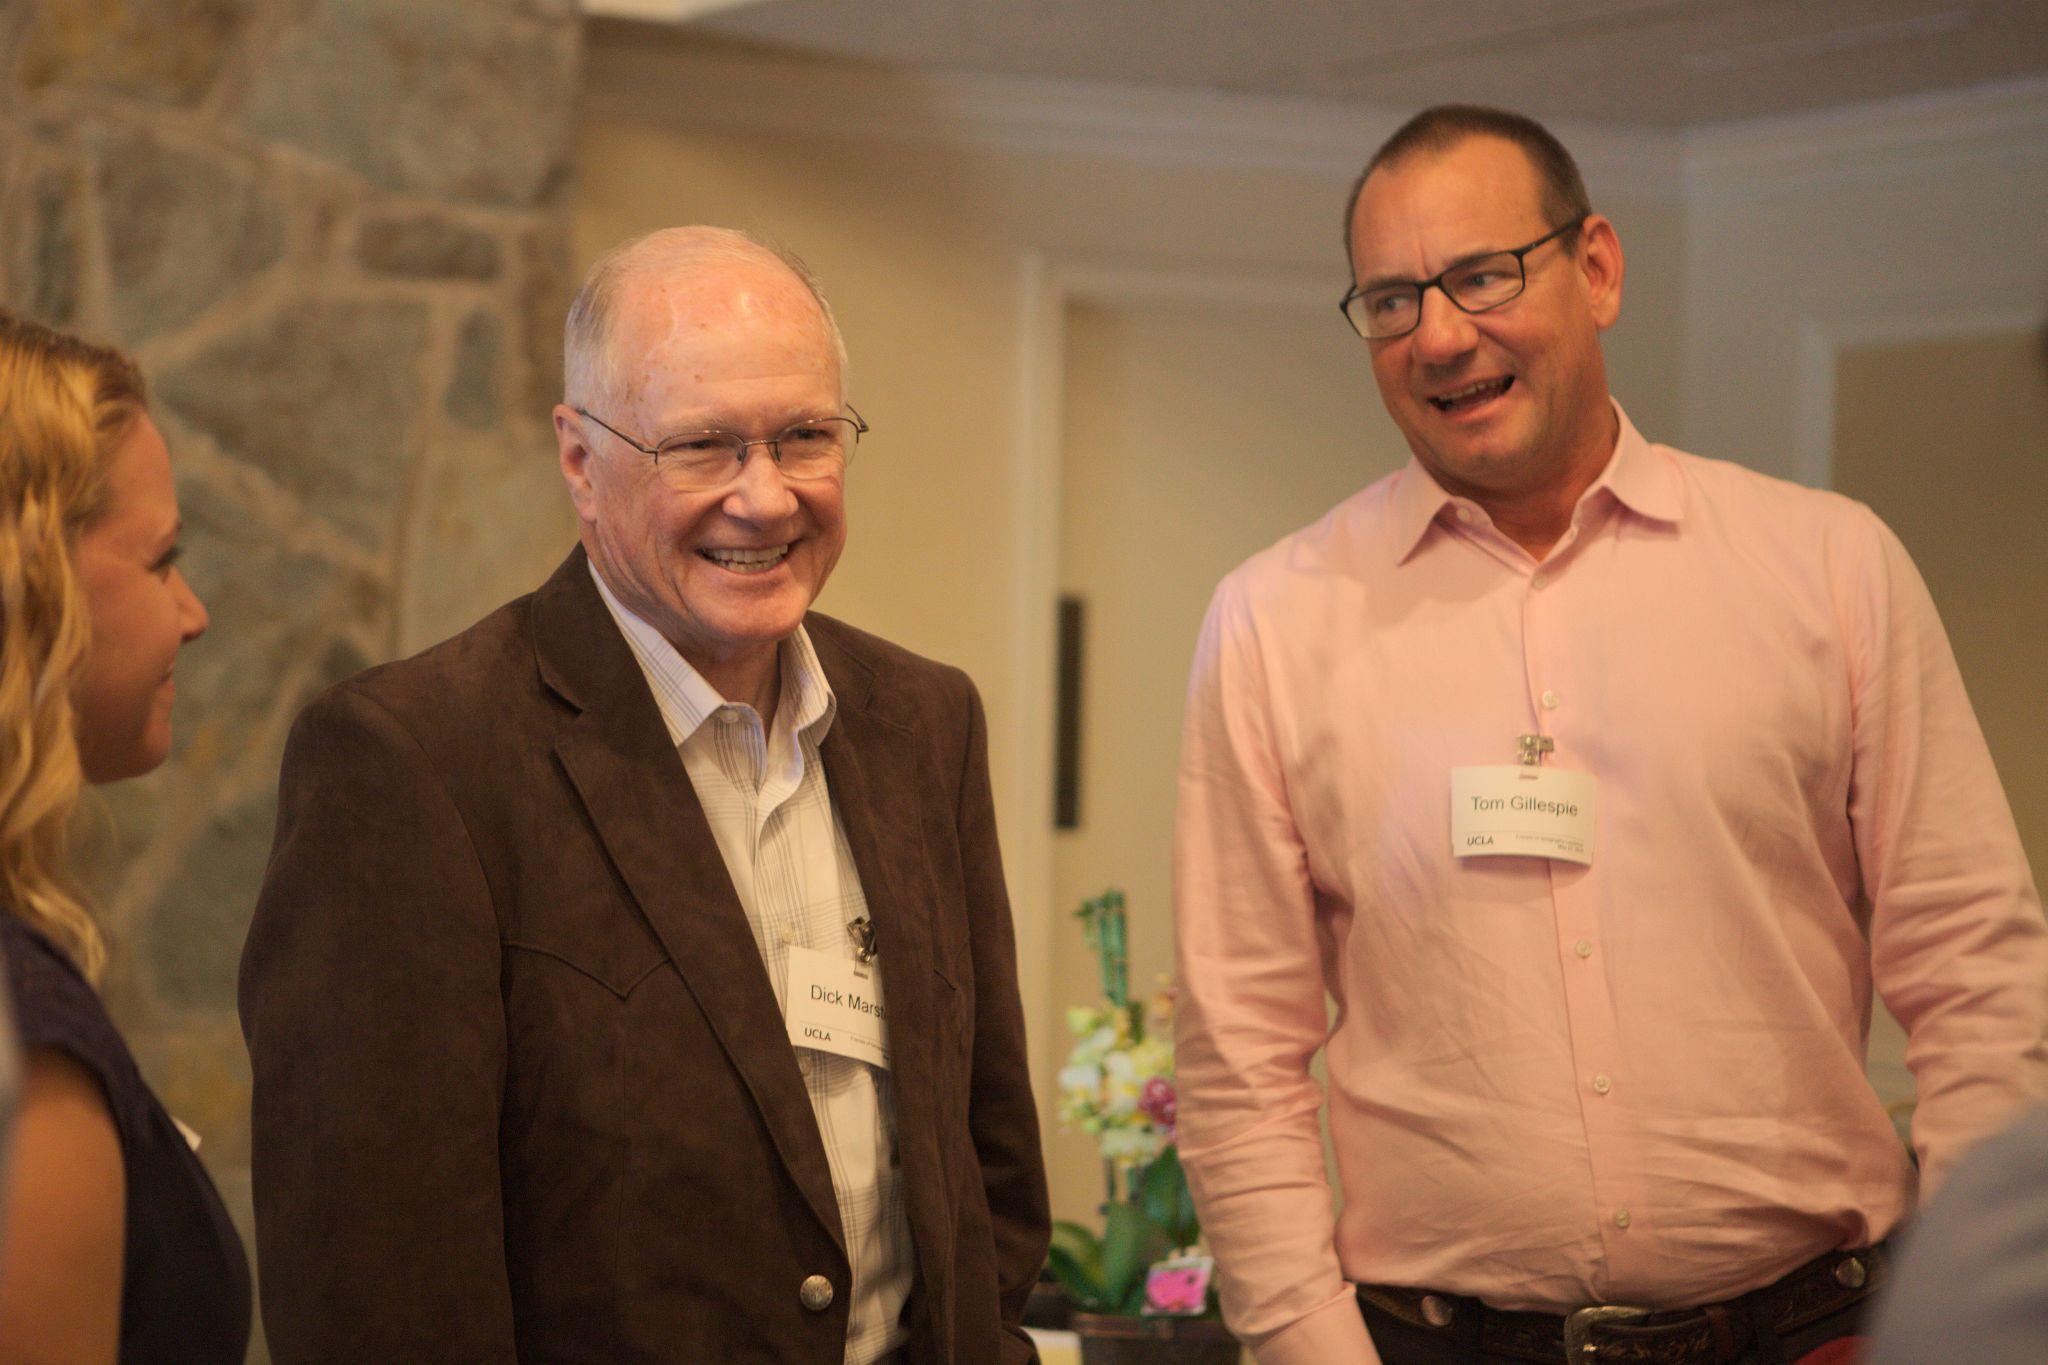 Professor Gillespie and Dick Marston